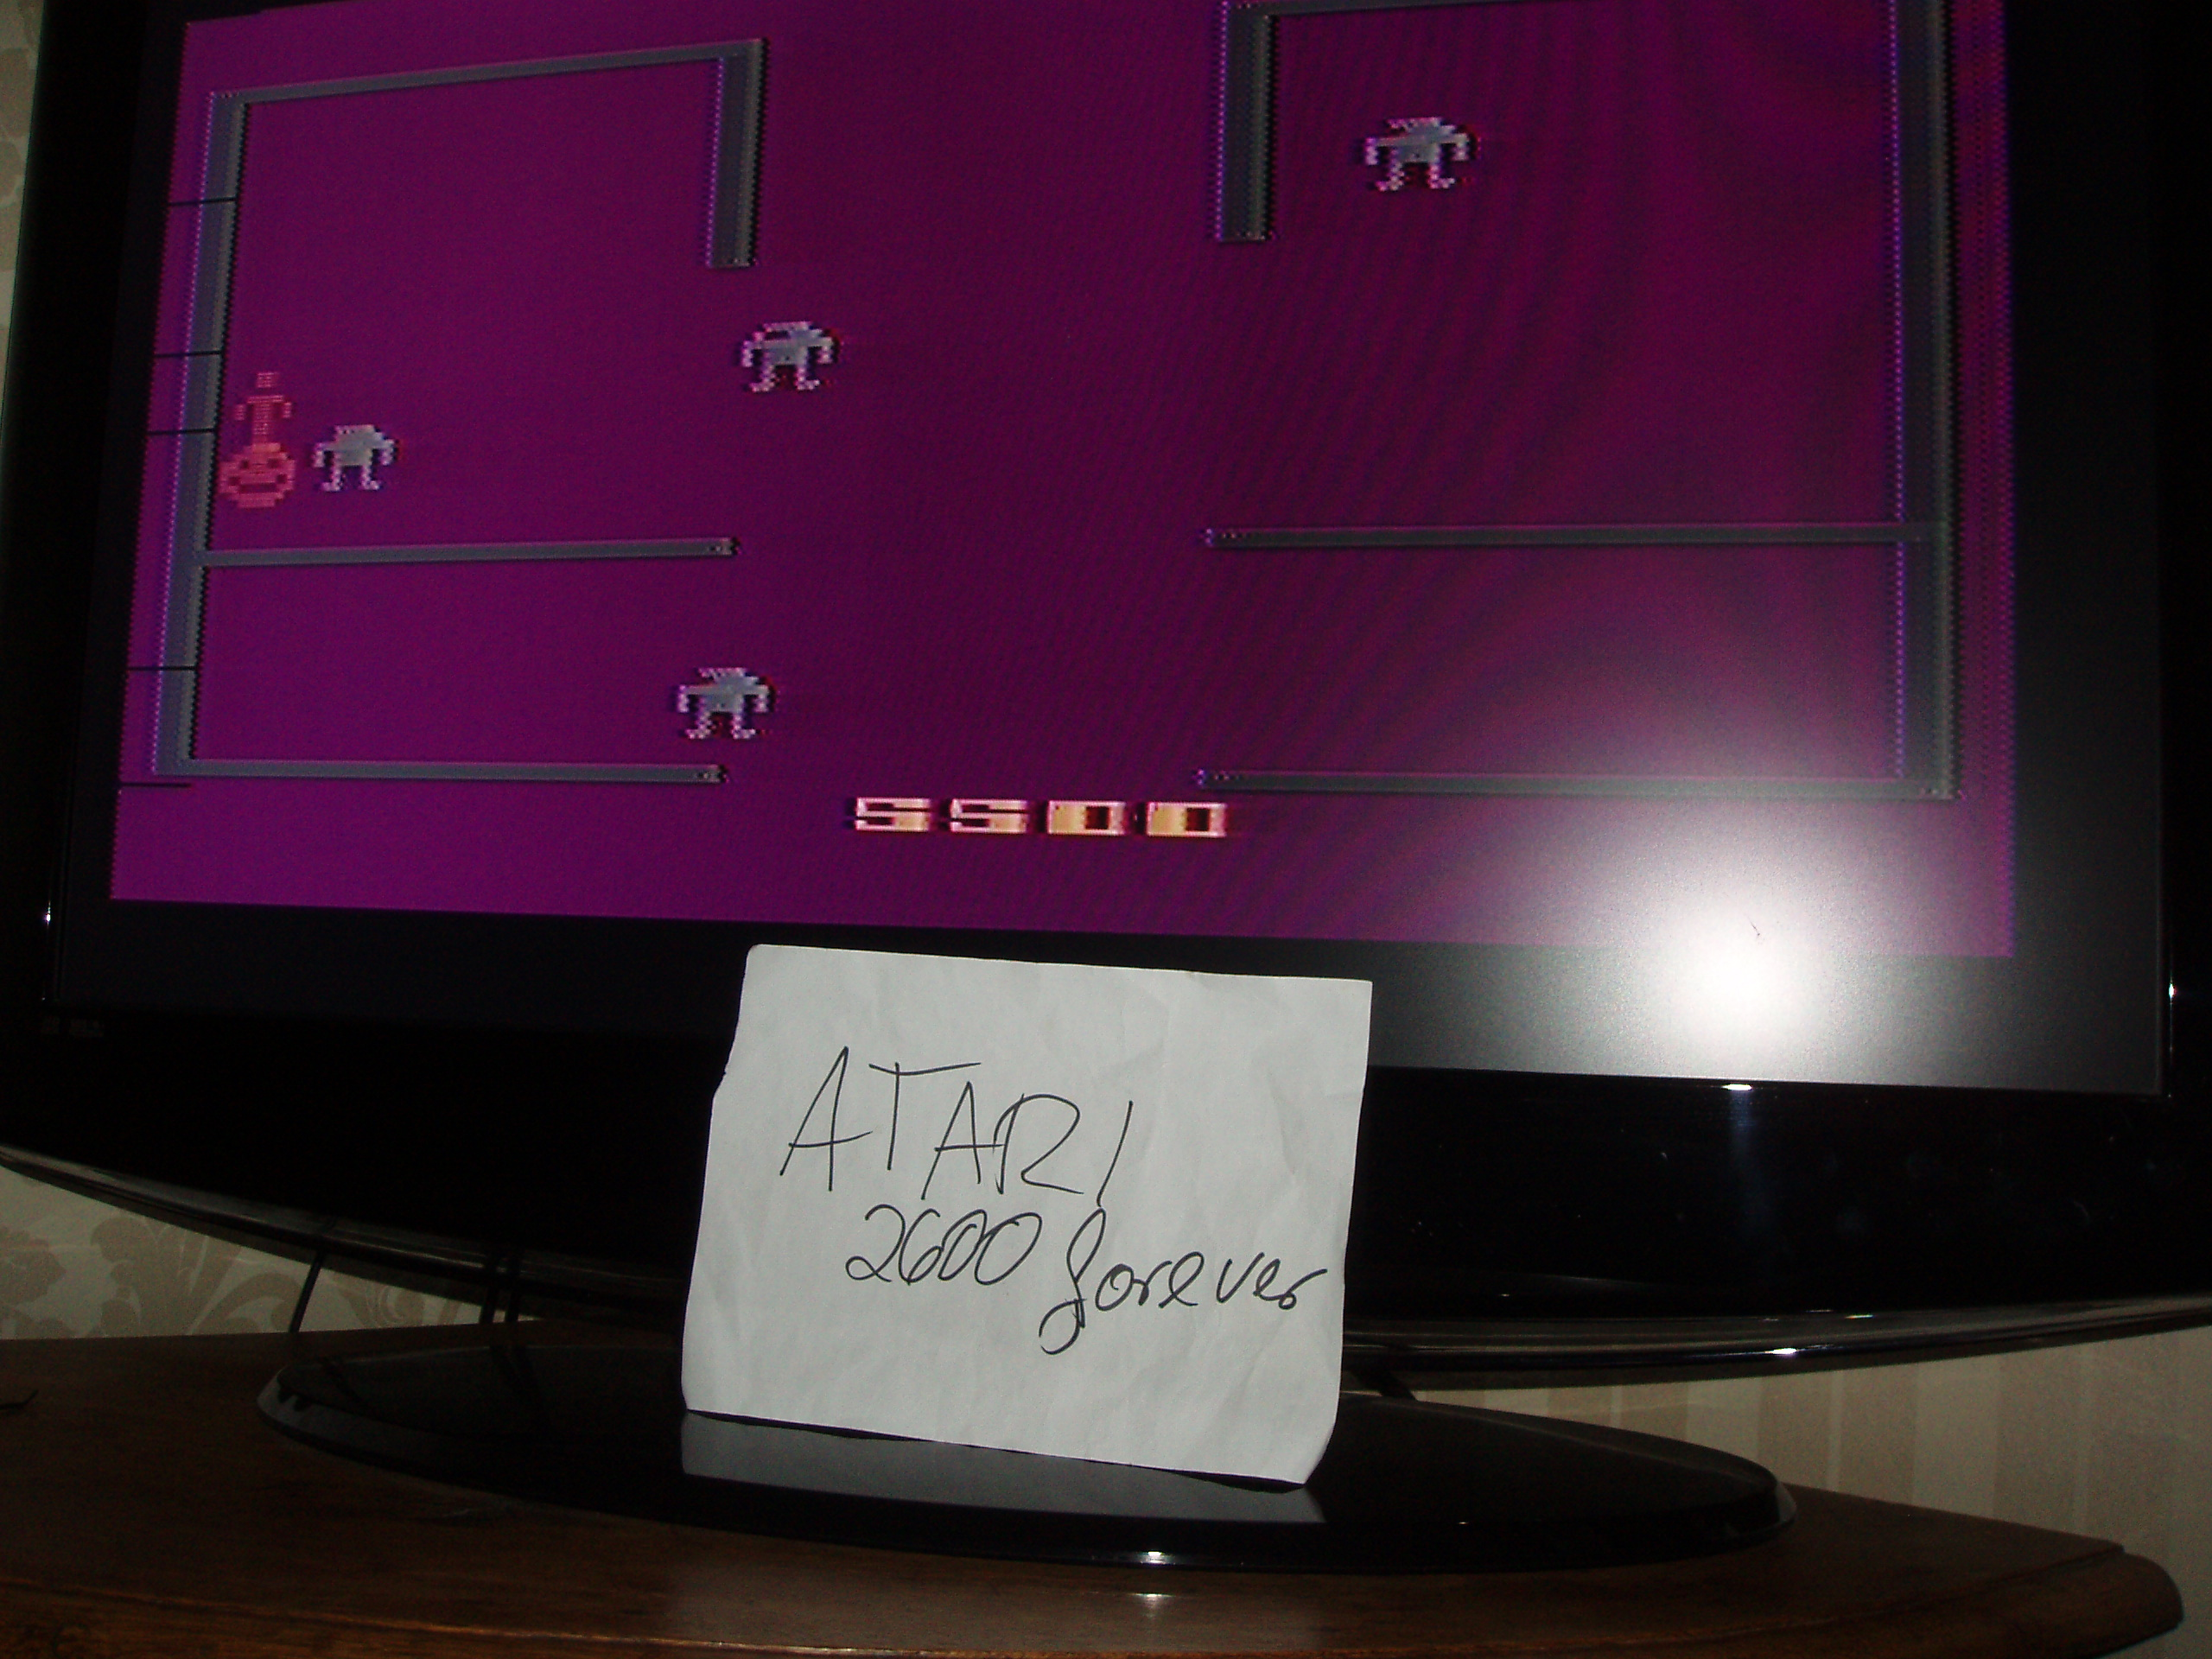 atari2600forever: Berzerk: Game 5 (Atari 2600) 5,500 points on 2019-01-12 05:21:24